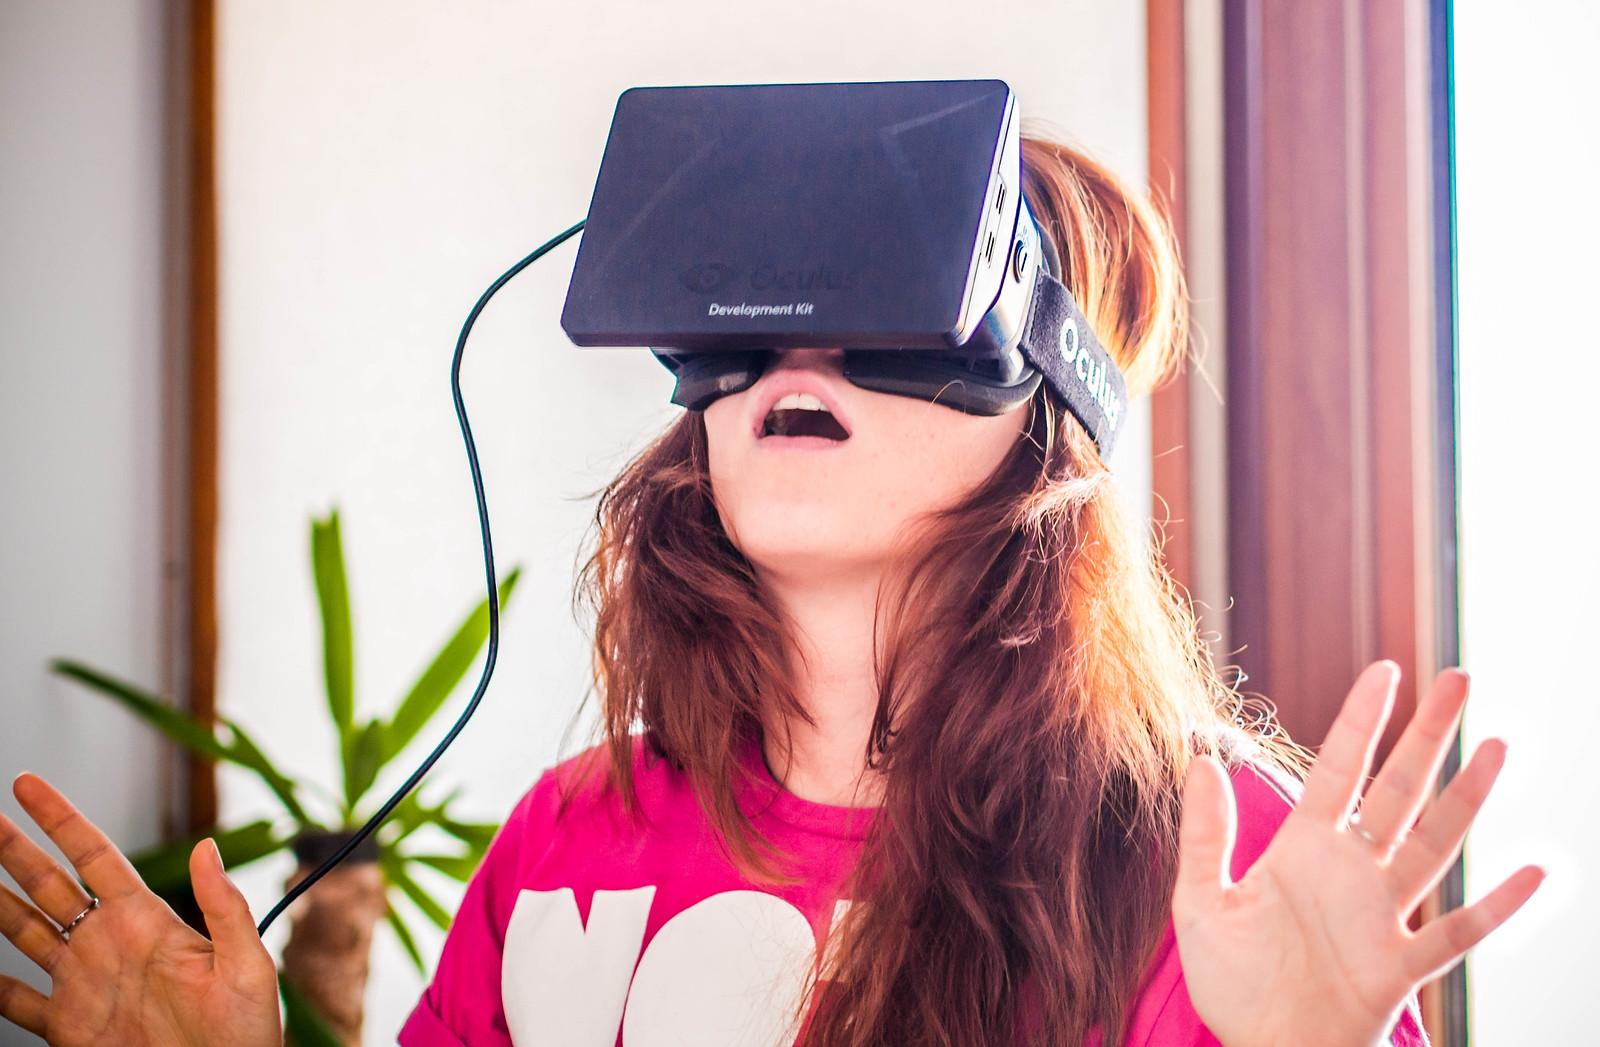 Anna Bashmakova and Oculus Rift